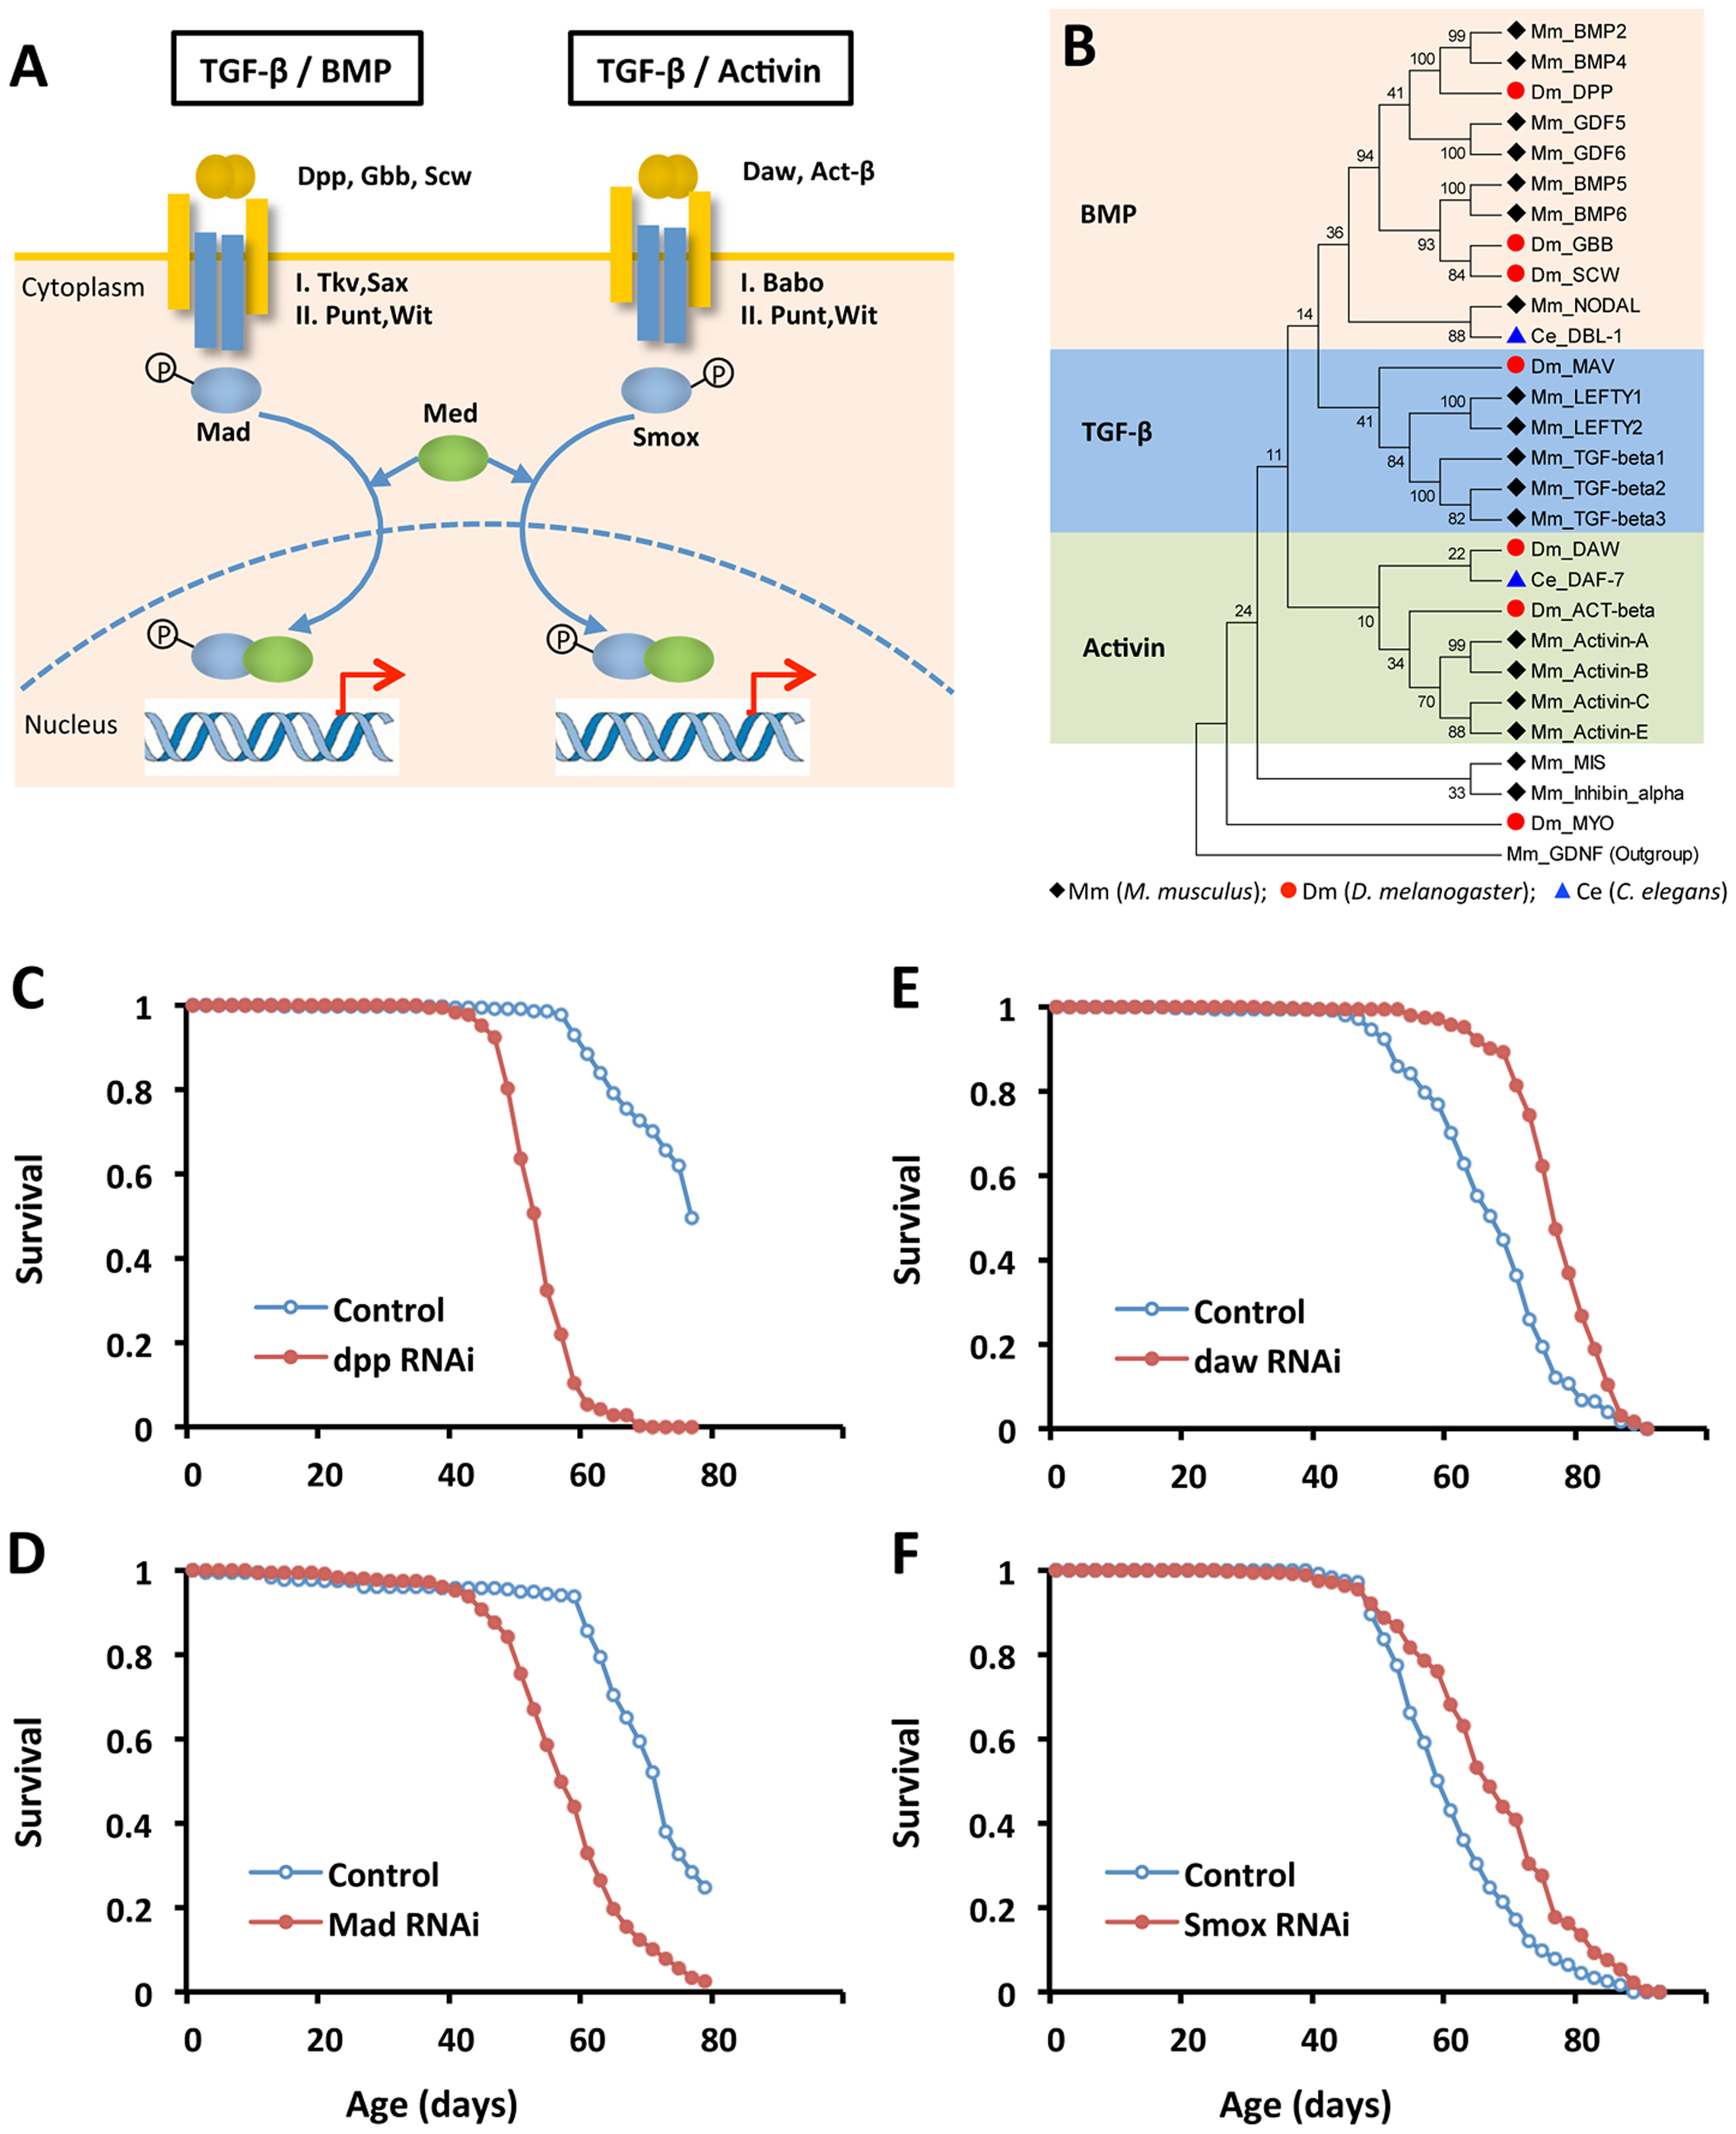 Reducing Activin signaling, but not BMP signaling prolongs lifespan in <i>Drosophila</i>.